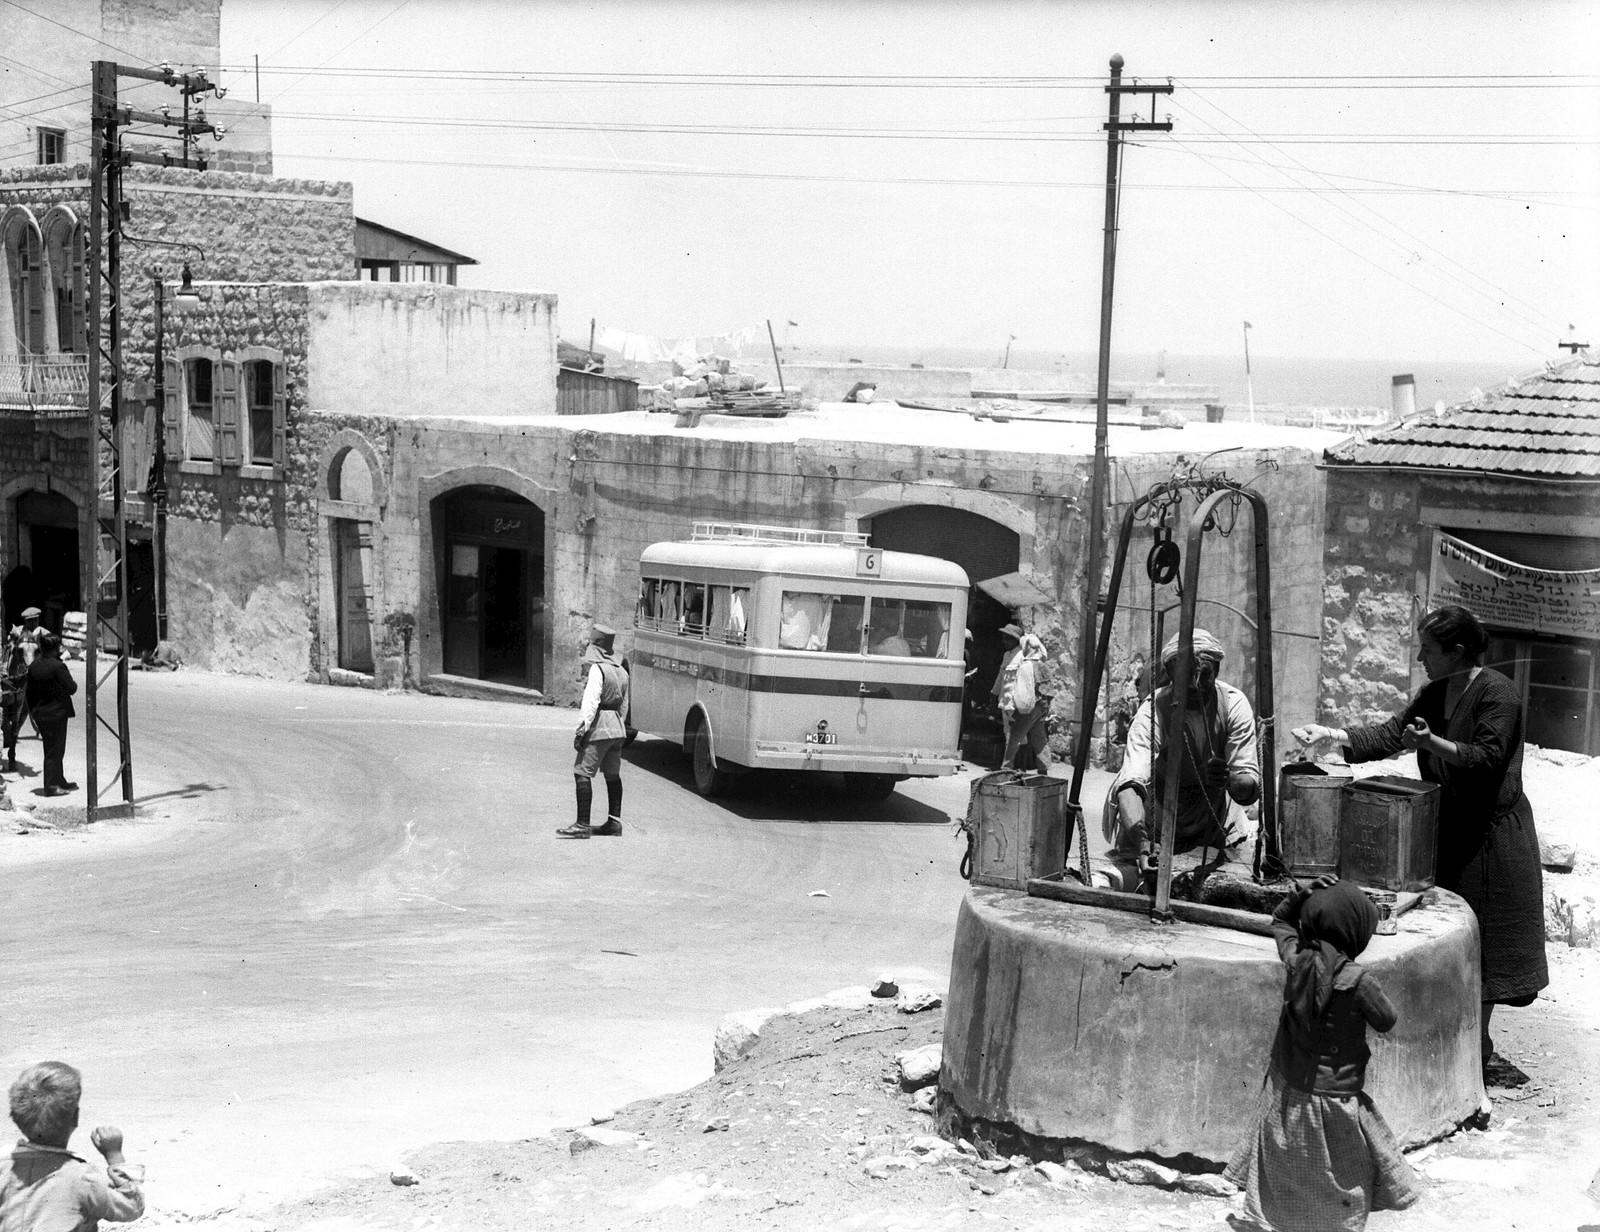 1934. Хайфа. Арабы берут воду из колодца на Стэнтон-стрит